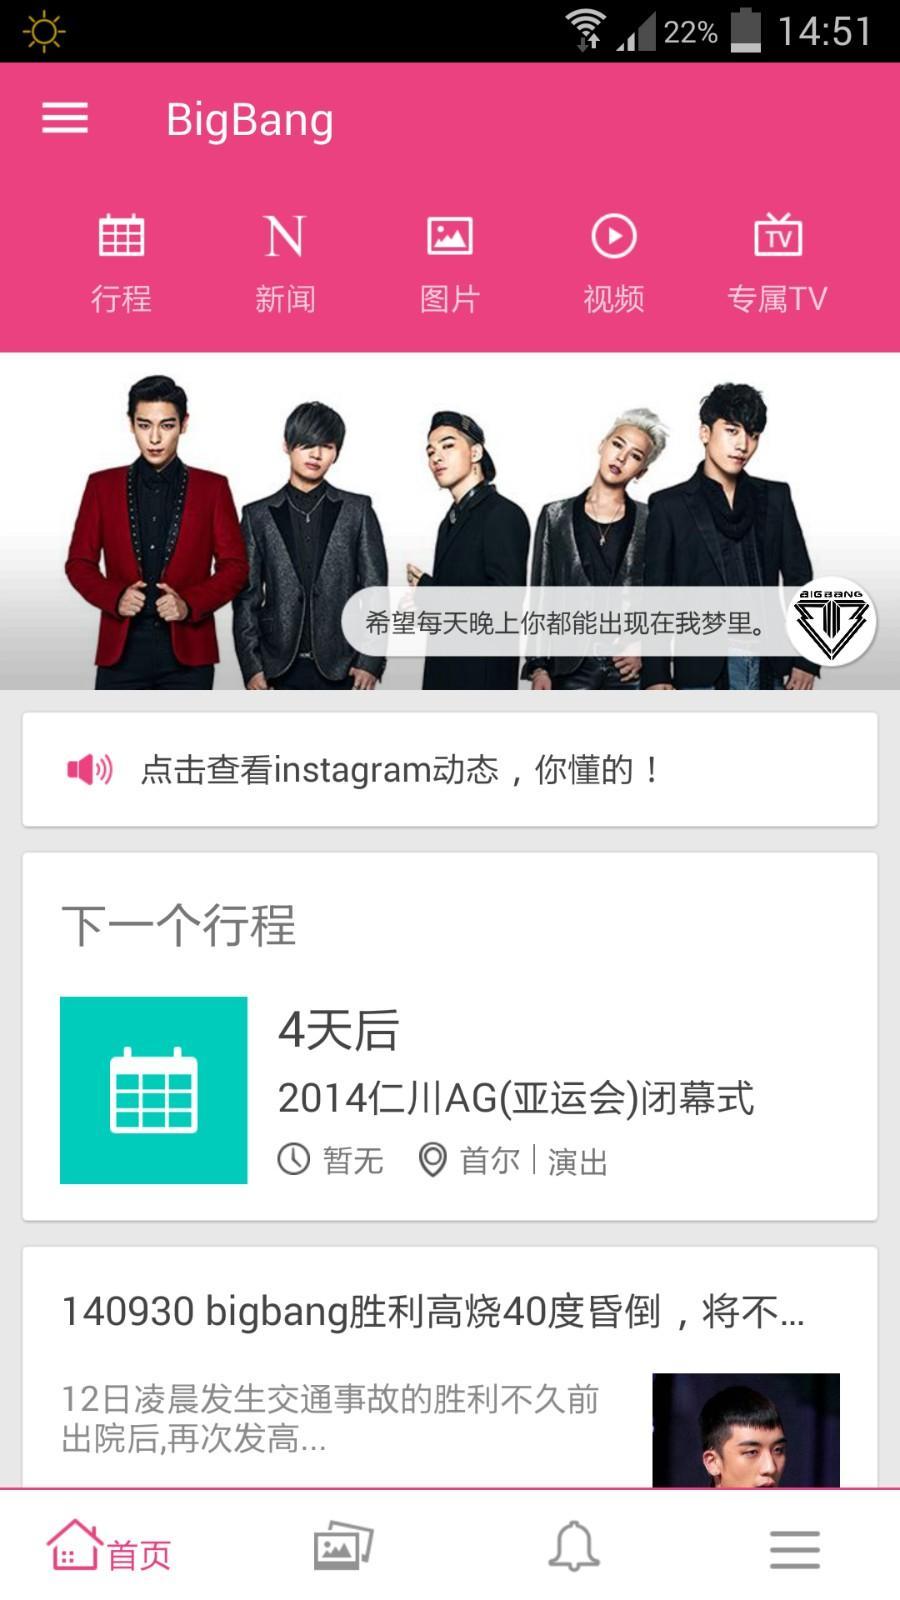 [bigbang][新闻]140930 爱豆新增明星instagram查看功能图片